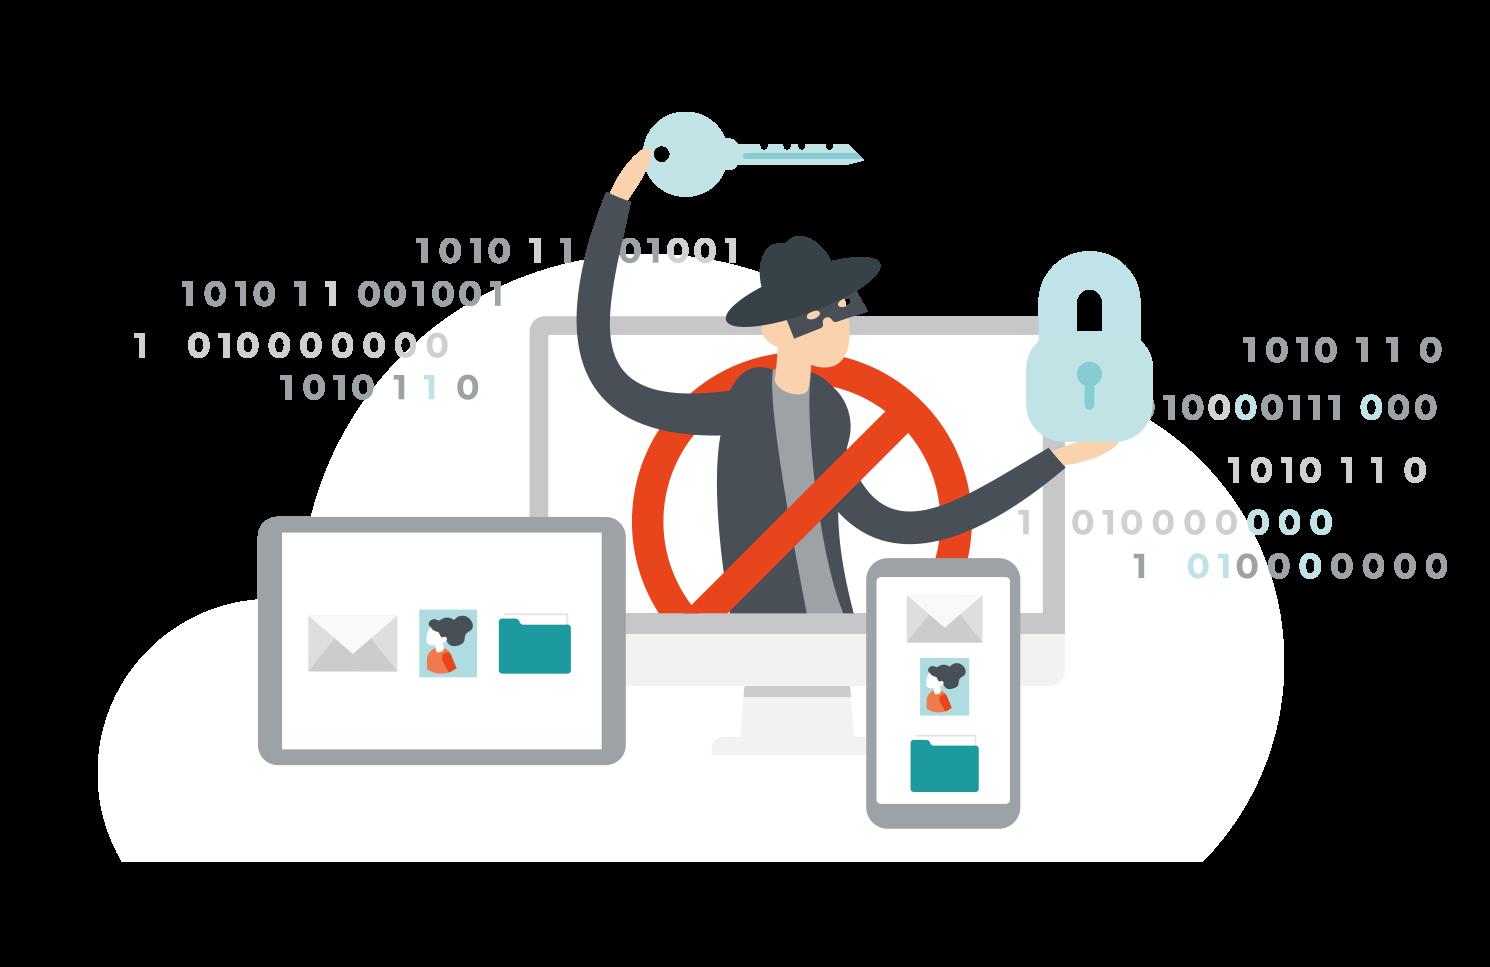 Phishingový útok phishing